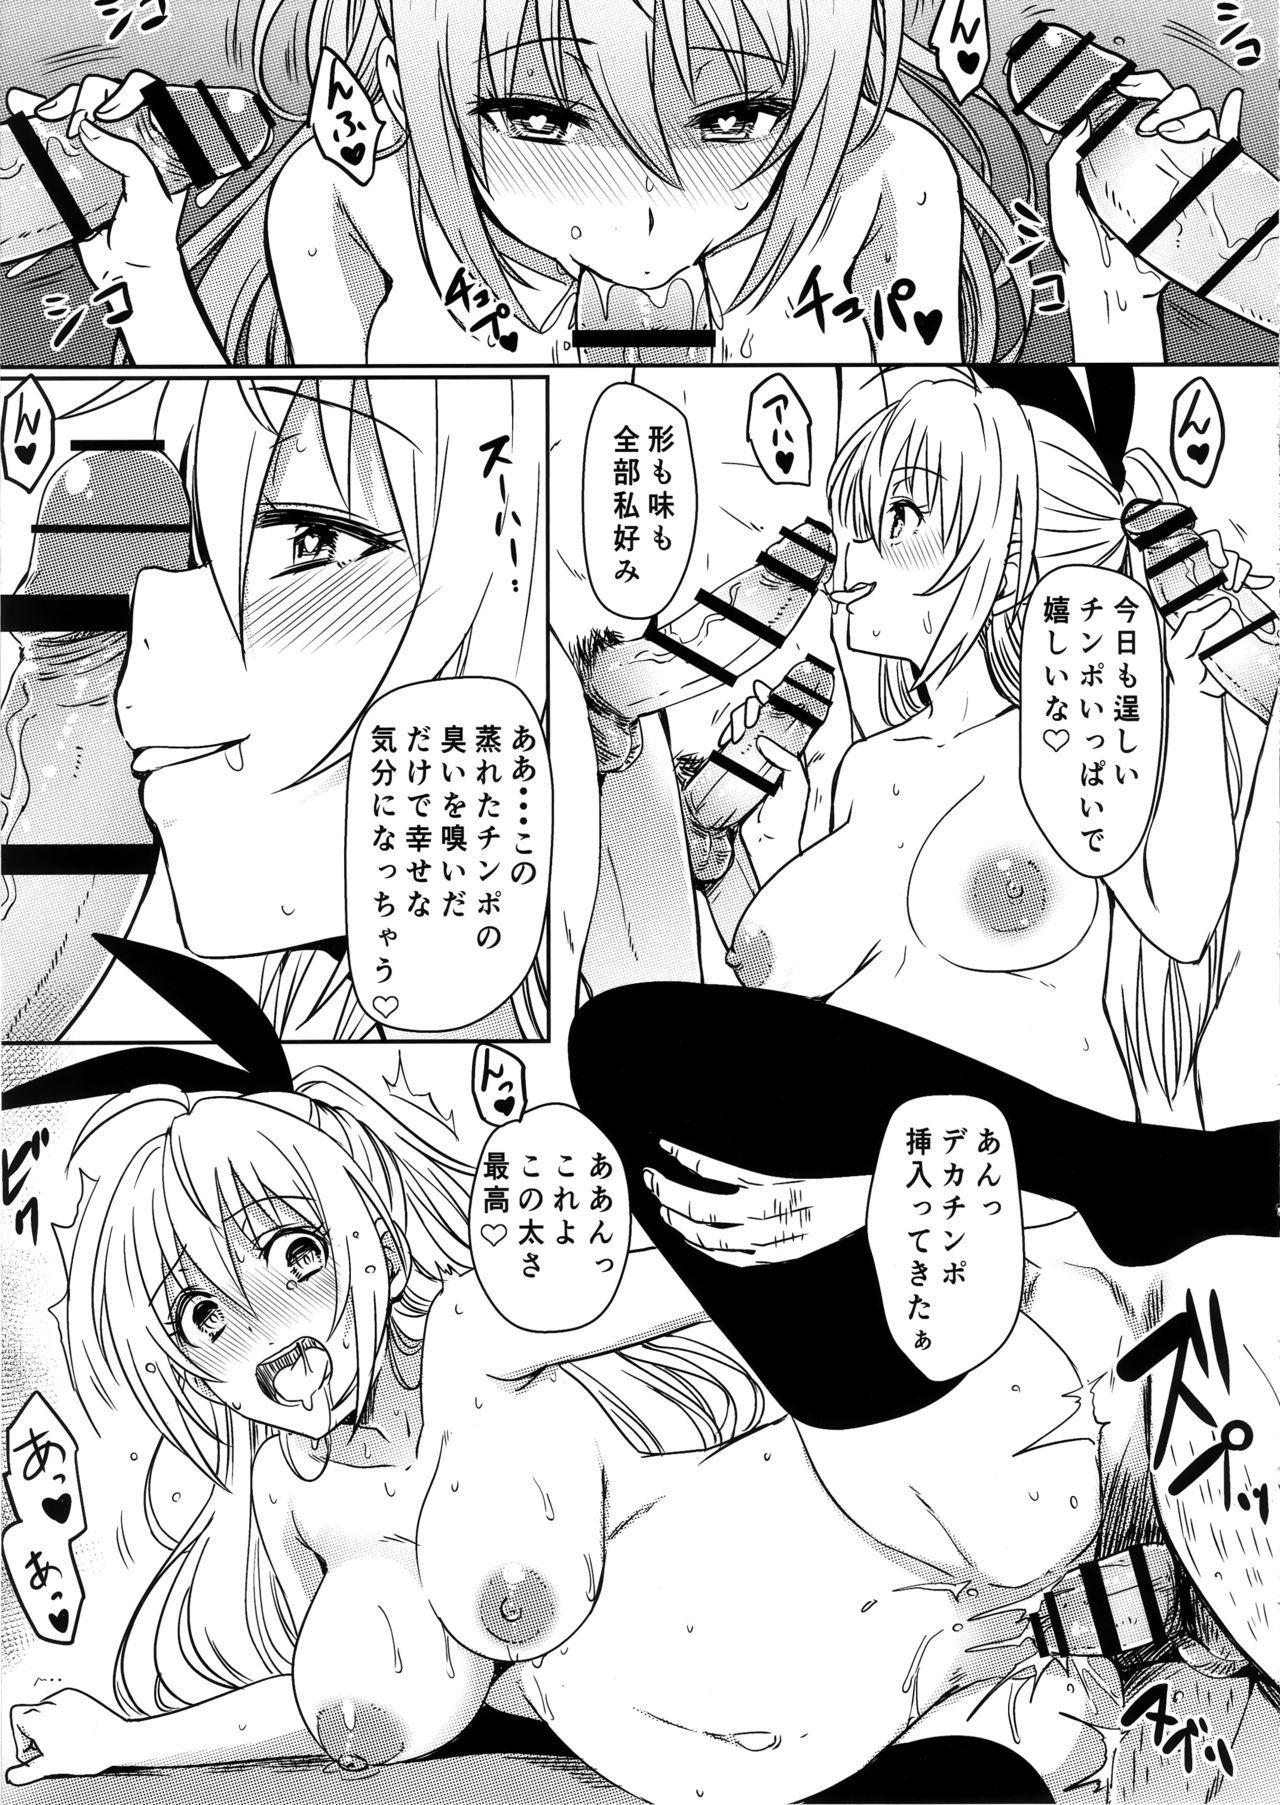 (C96) [Kaminari-neko (Eitarou)] Yamikoi -Saimin- 4 (Nisekoi) 19